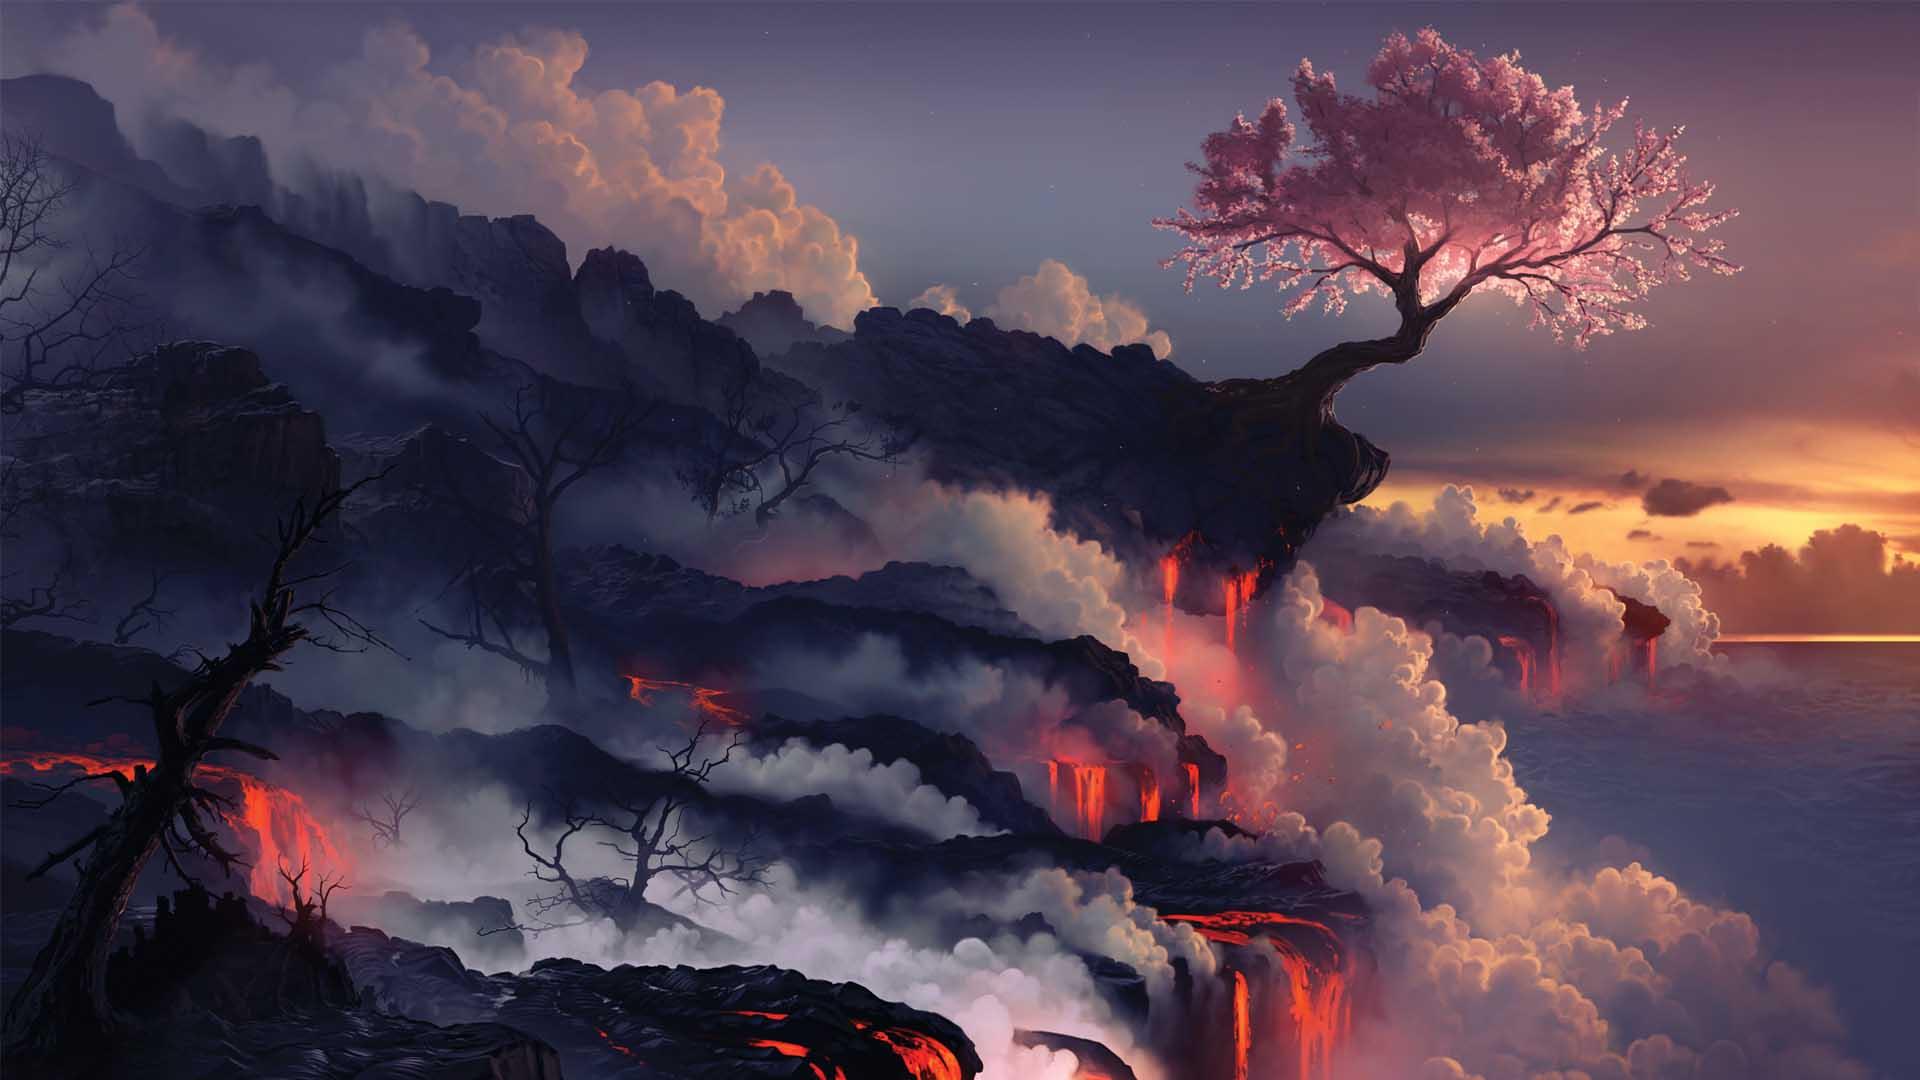 Vibrant Background Wallpaper 35764   Baltana 1920x1080